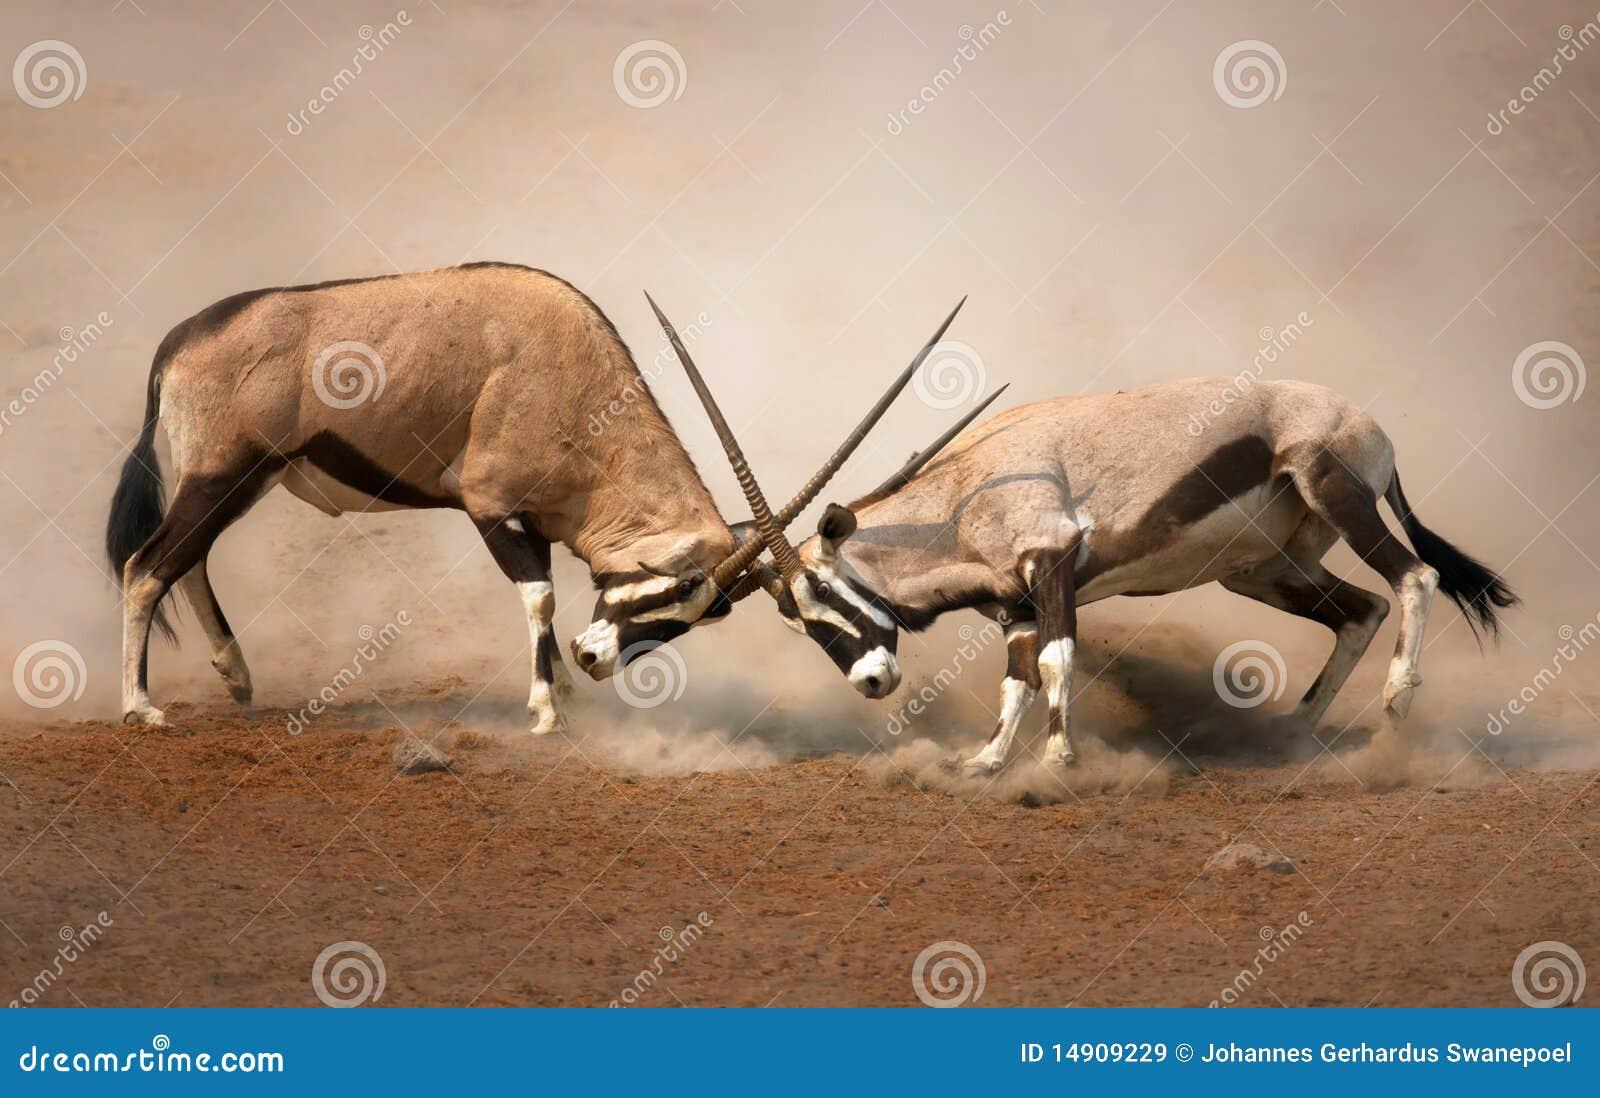 Gemsbok fight stock image. Image of dust, active ...